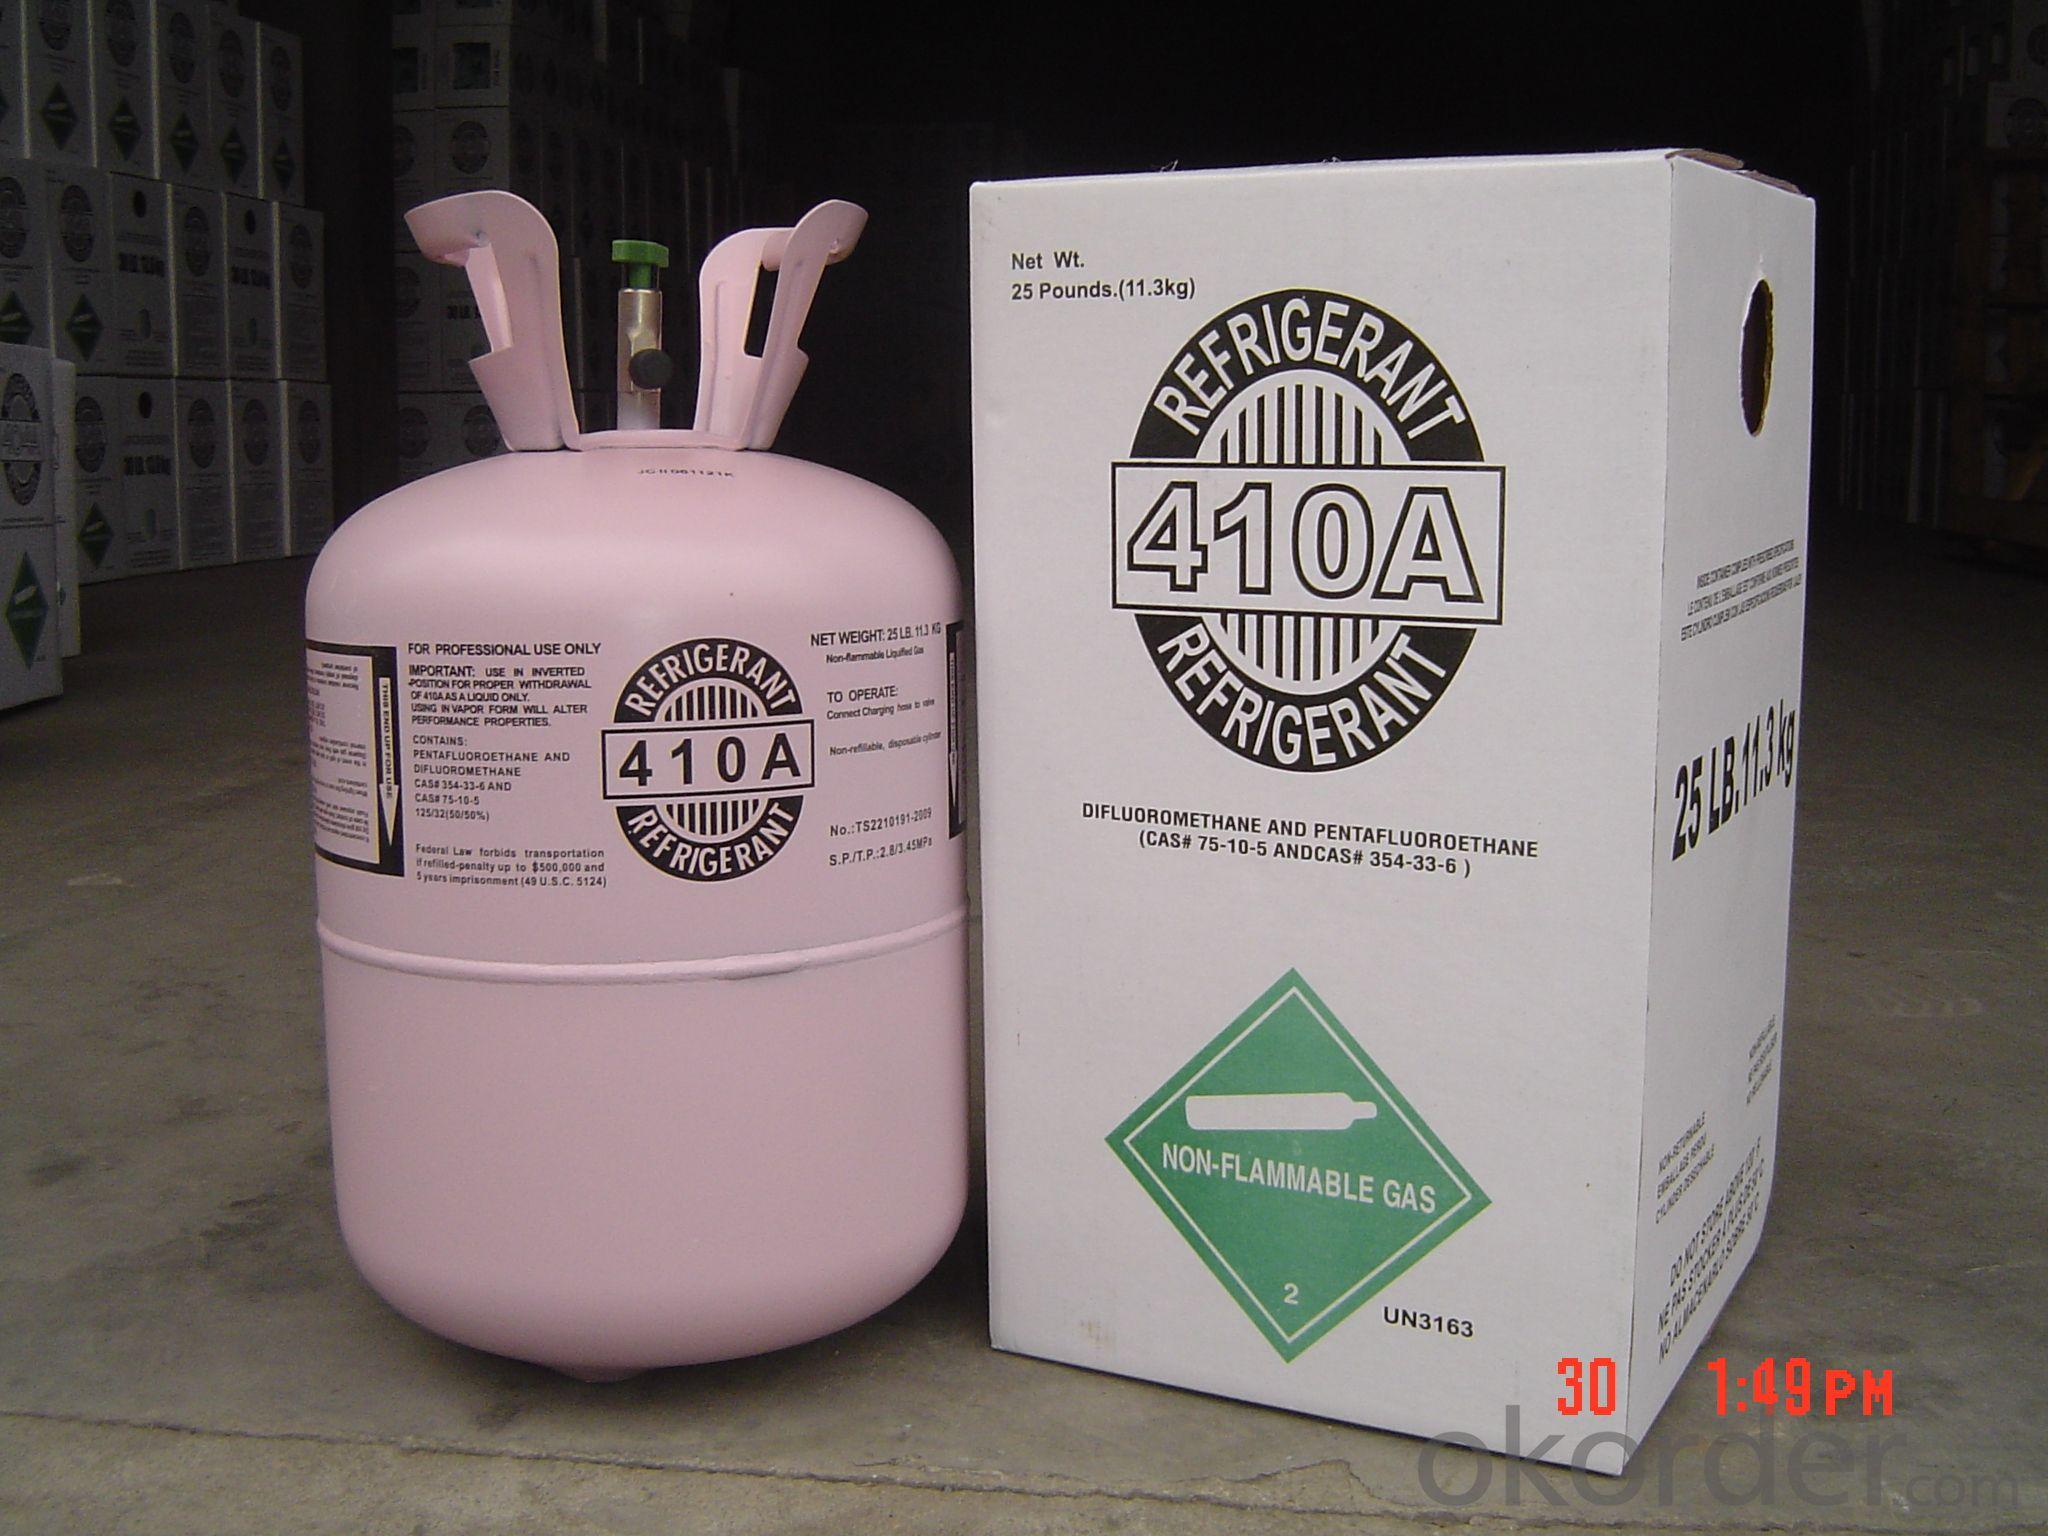 Refrigerant R410a in 25LB